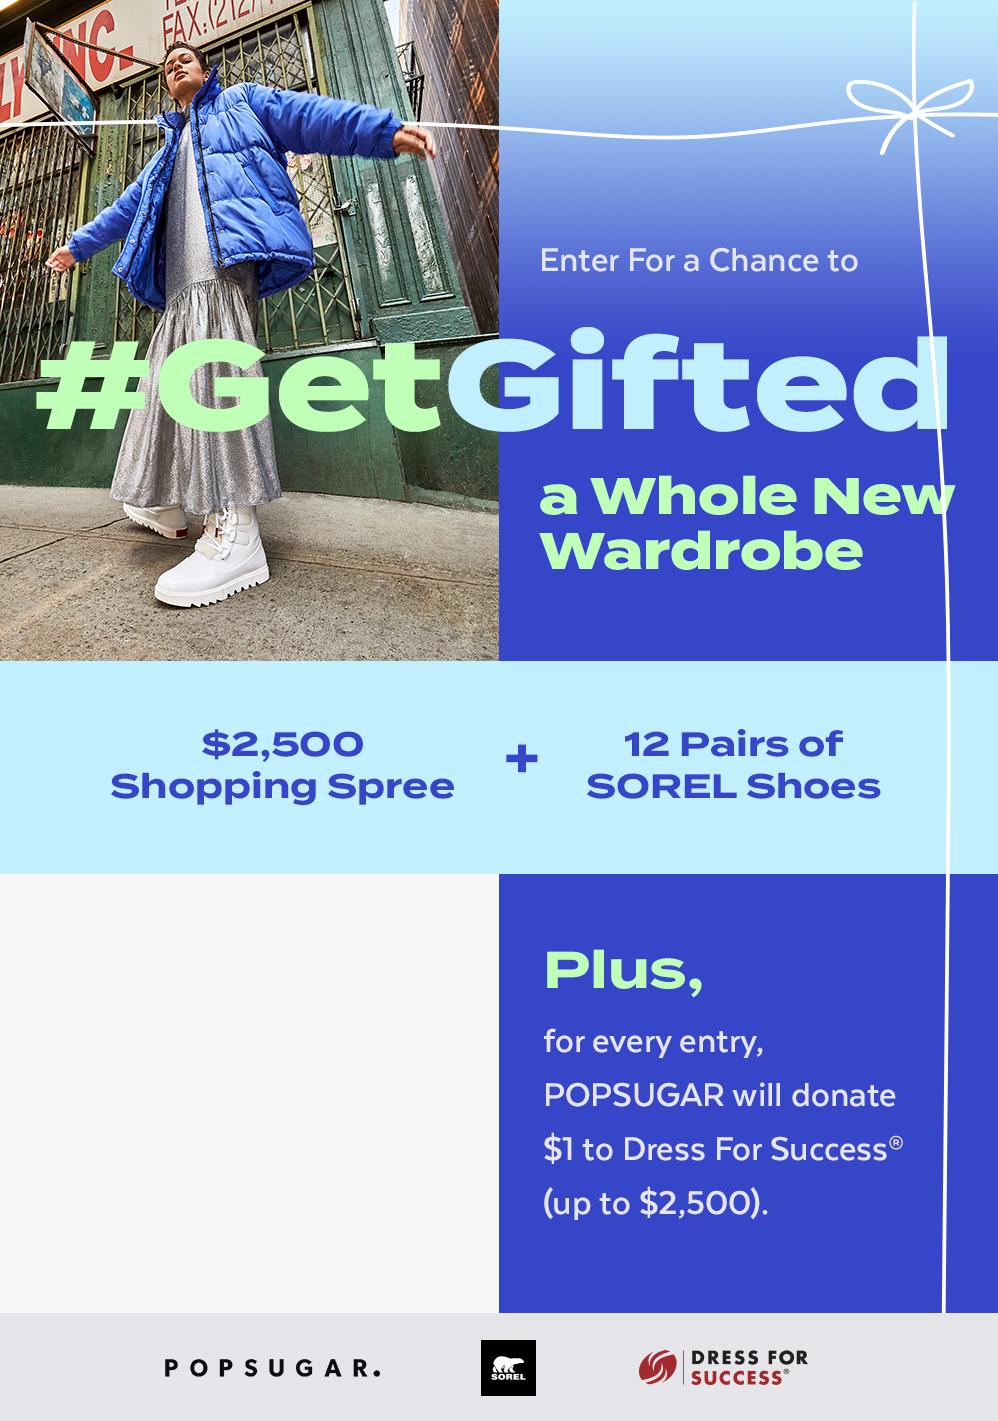 POPSUGAR x SOREL #GetGifted Giveaway 2020